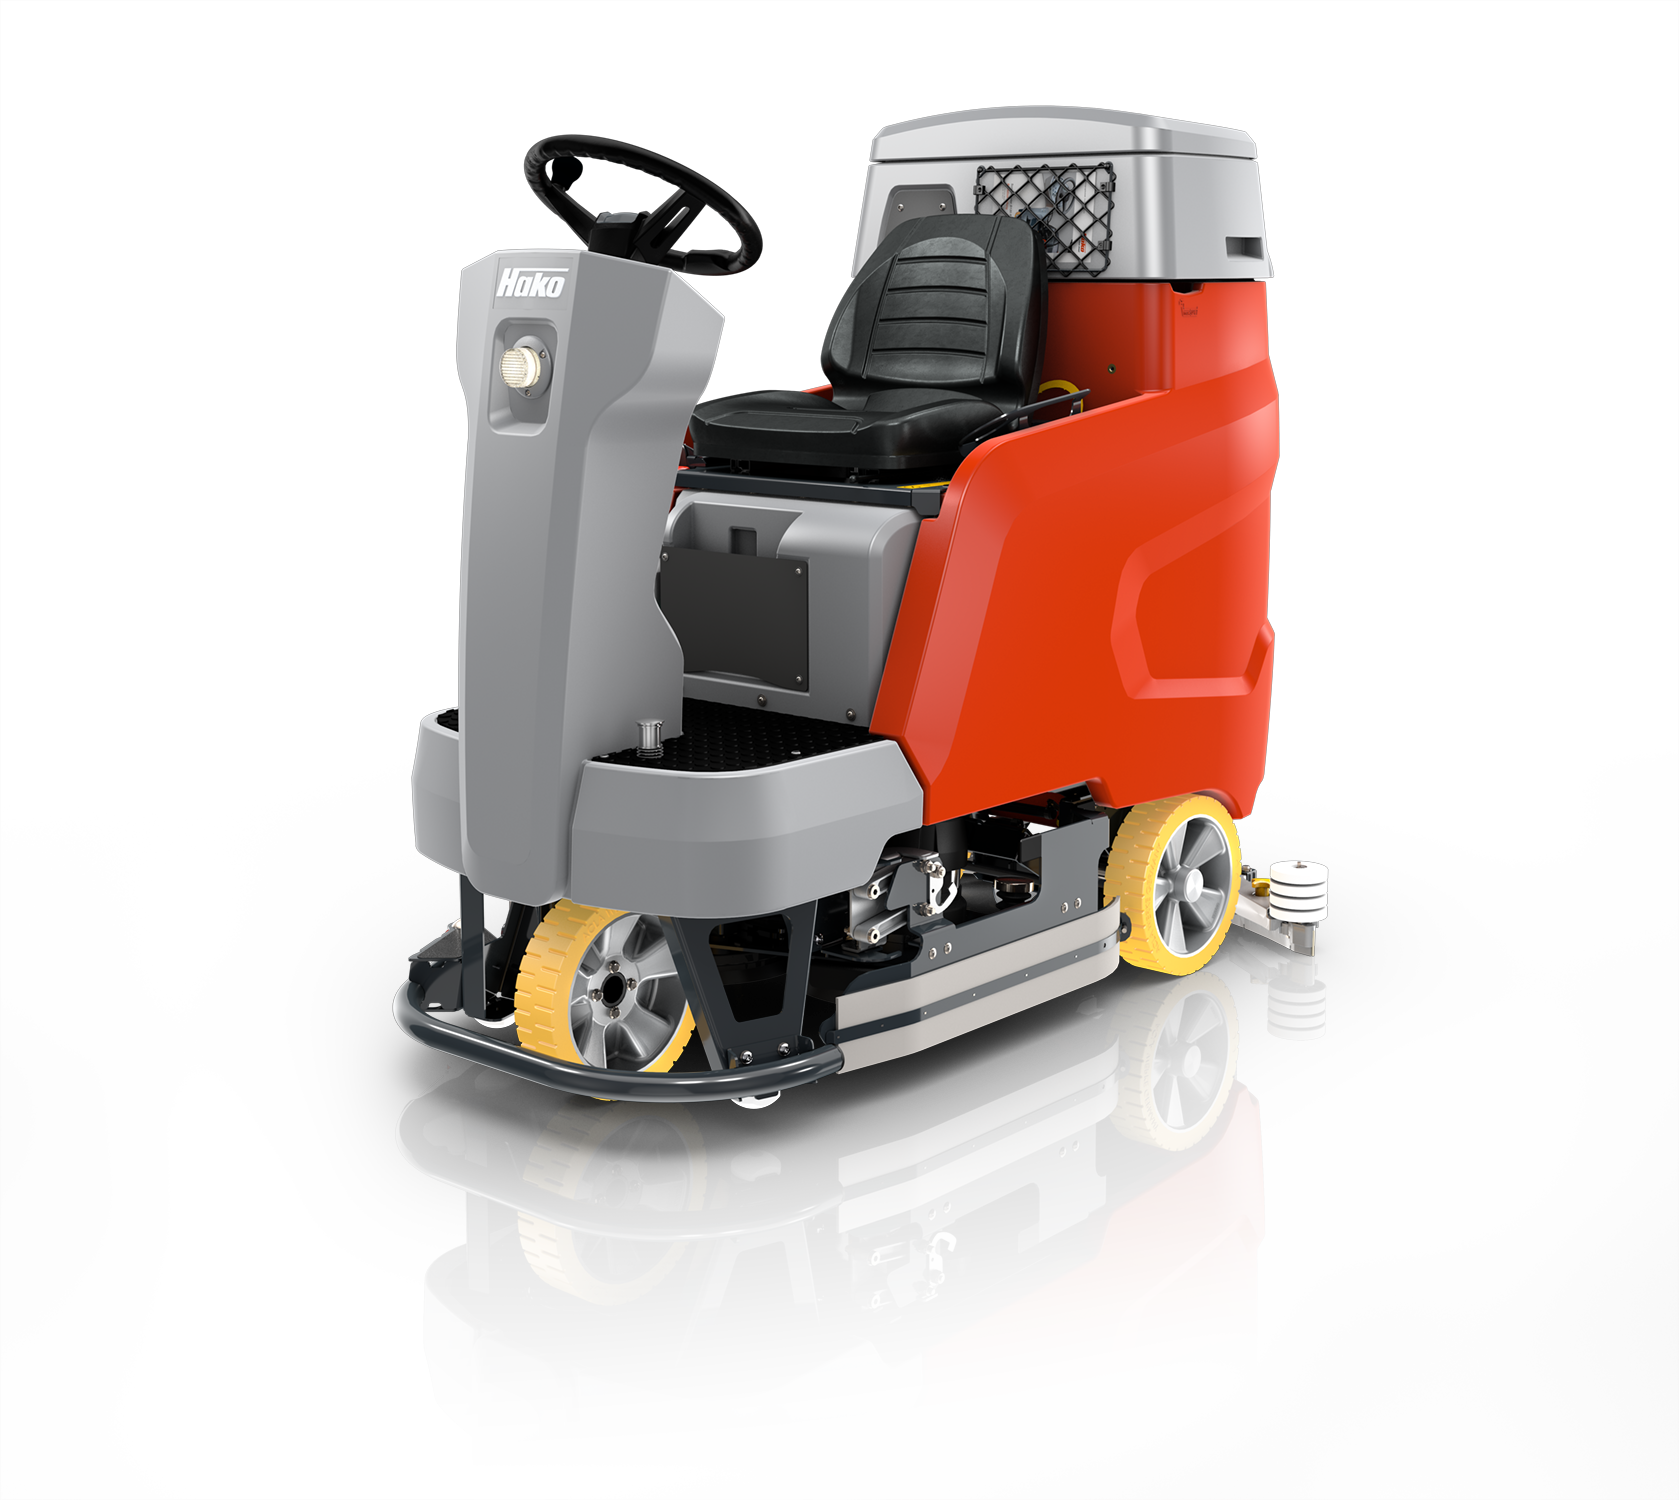 Scrubmaster B120 R Industrial Ride-on Floor Scrubber